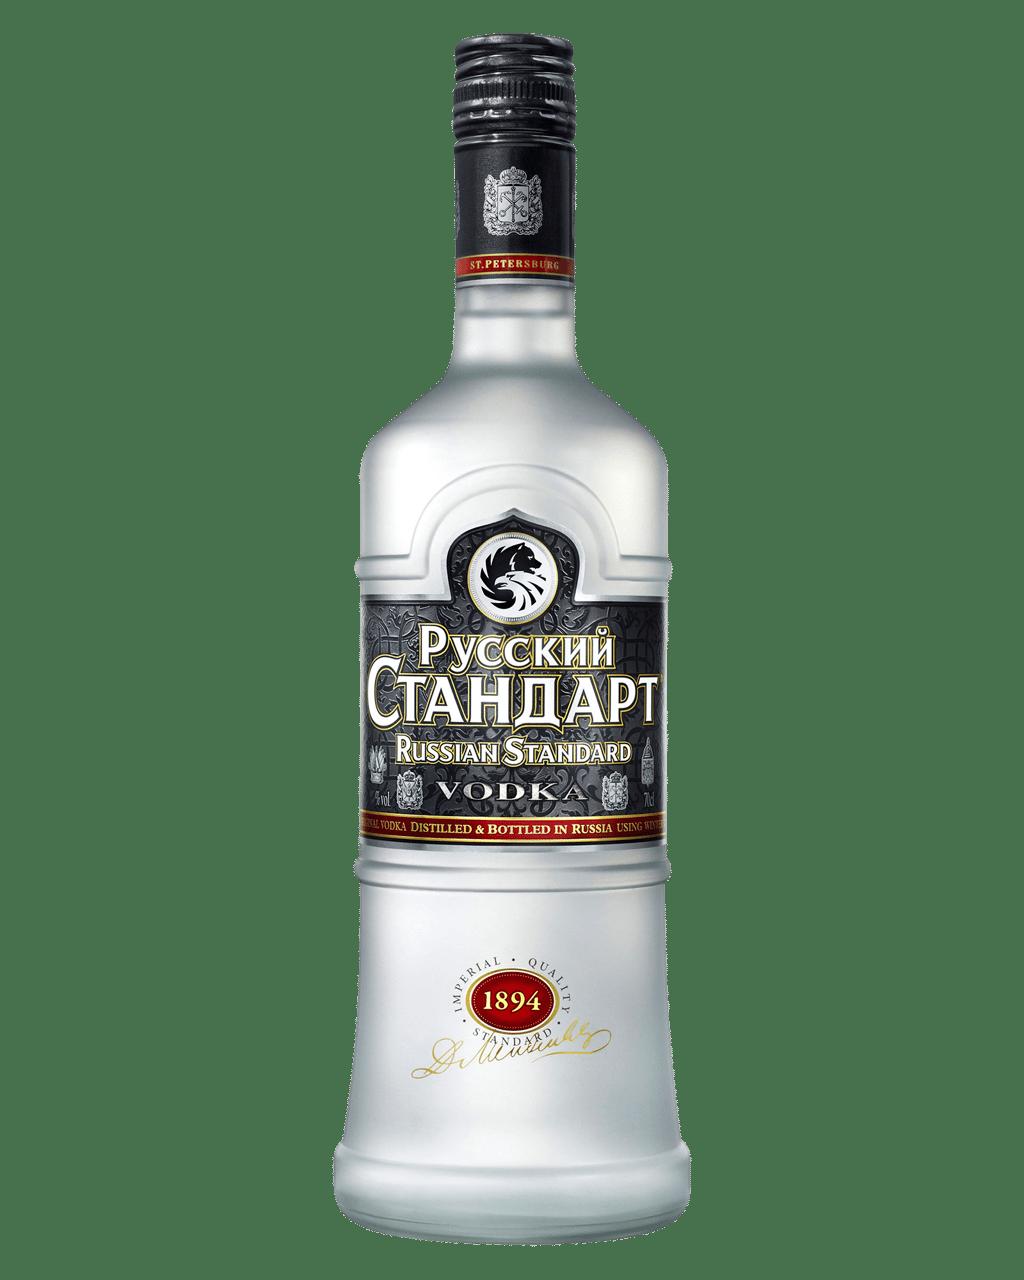 45934b1a9 Russian Standard St Petersburg Vodka 700mL | Dan Murphy's | Buy Wine,  Champagne, Beer & Spirits Online